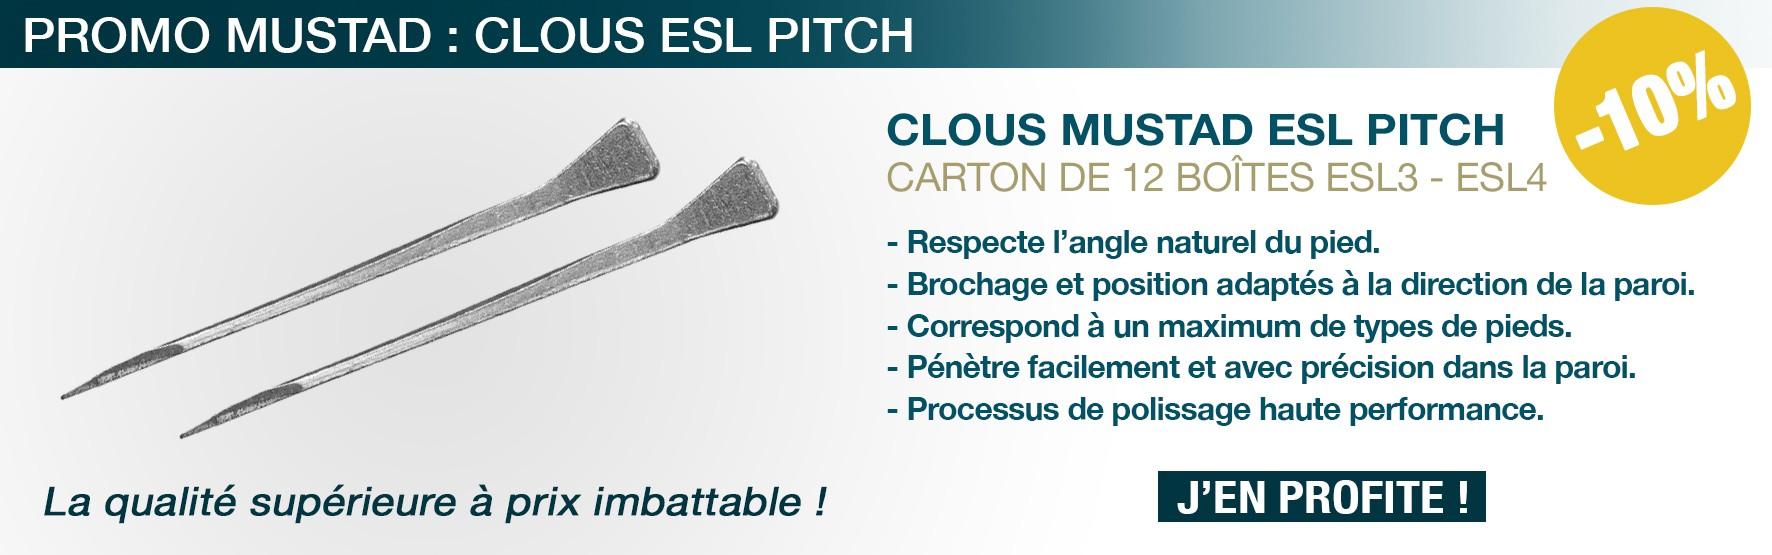 Materiel marechalerie - Clous - Mustad - Pitch - ferrer - ferrage